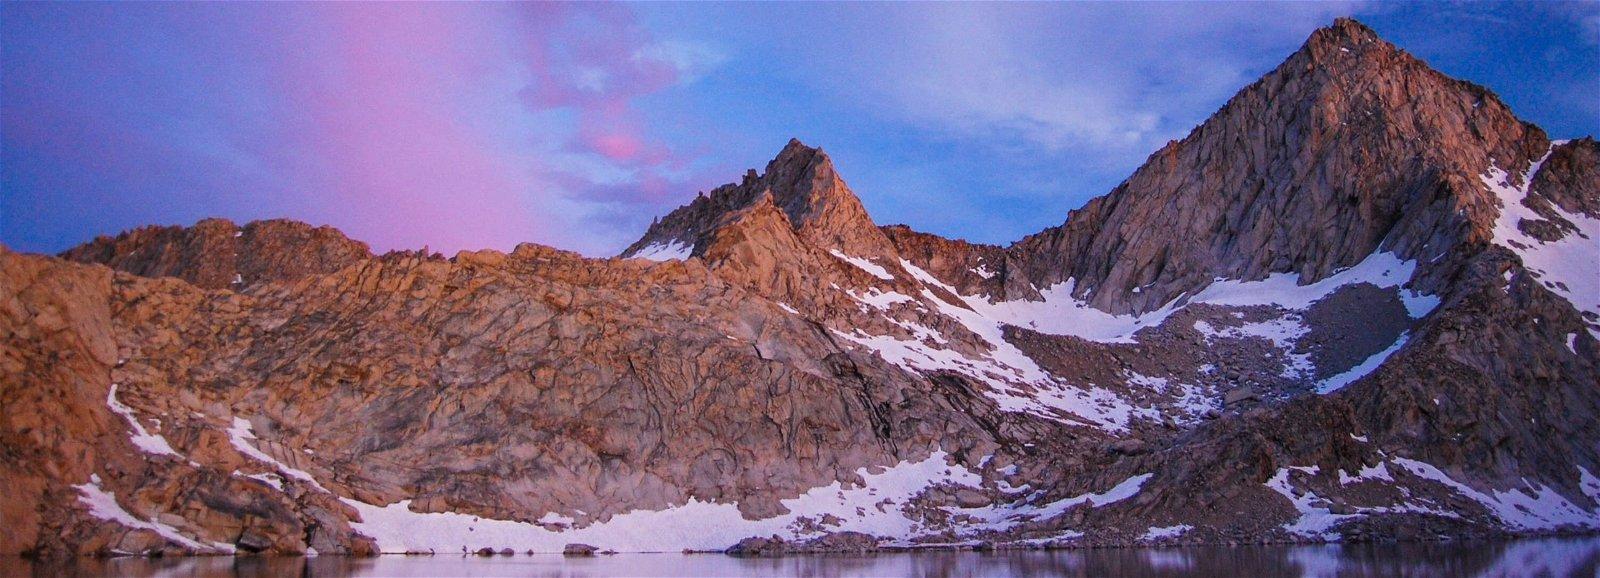 Sierra Nevada mountains at sunset